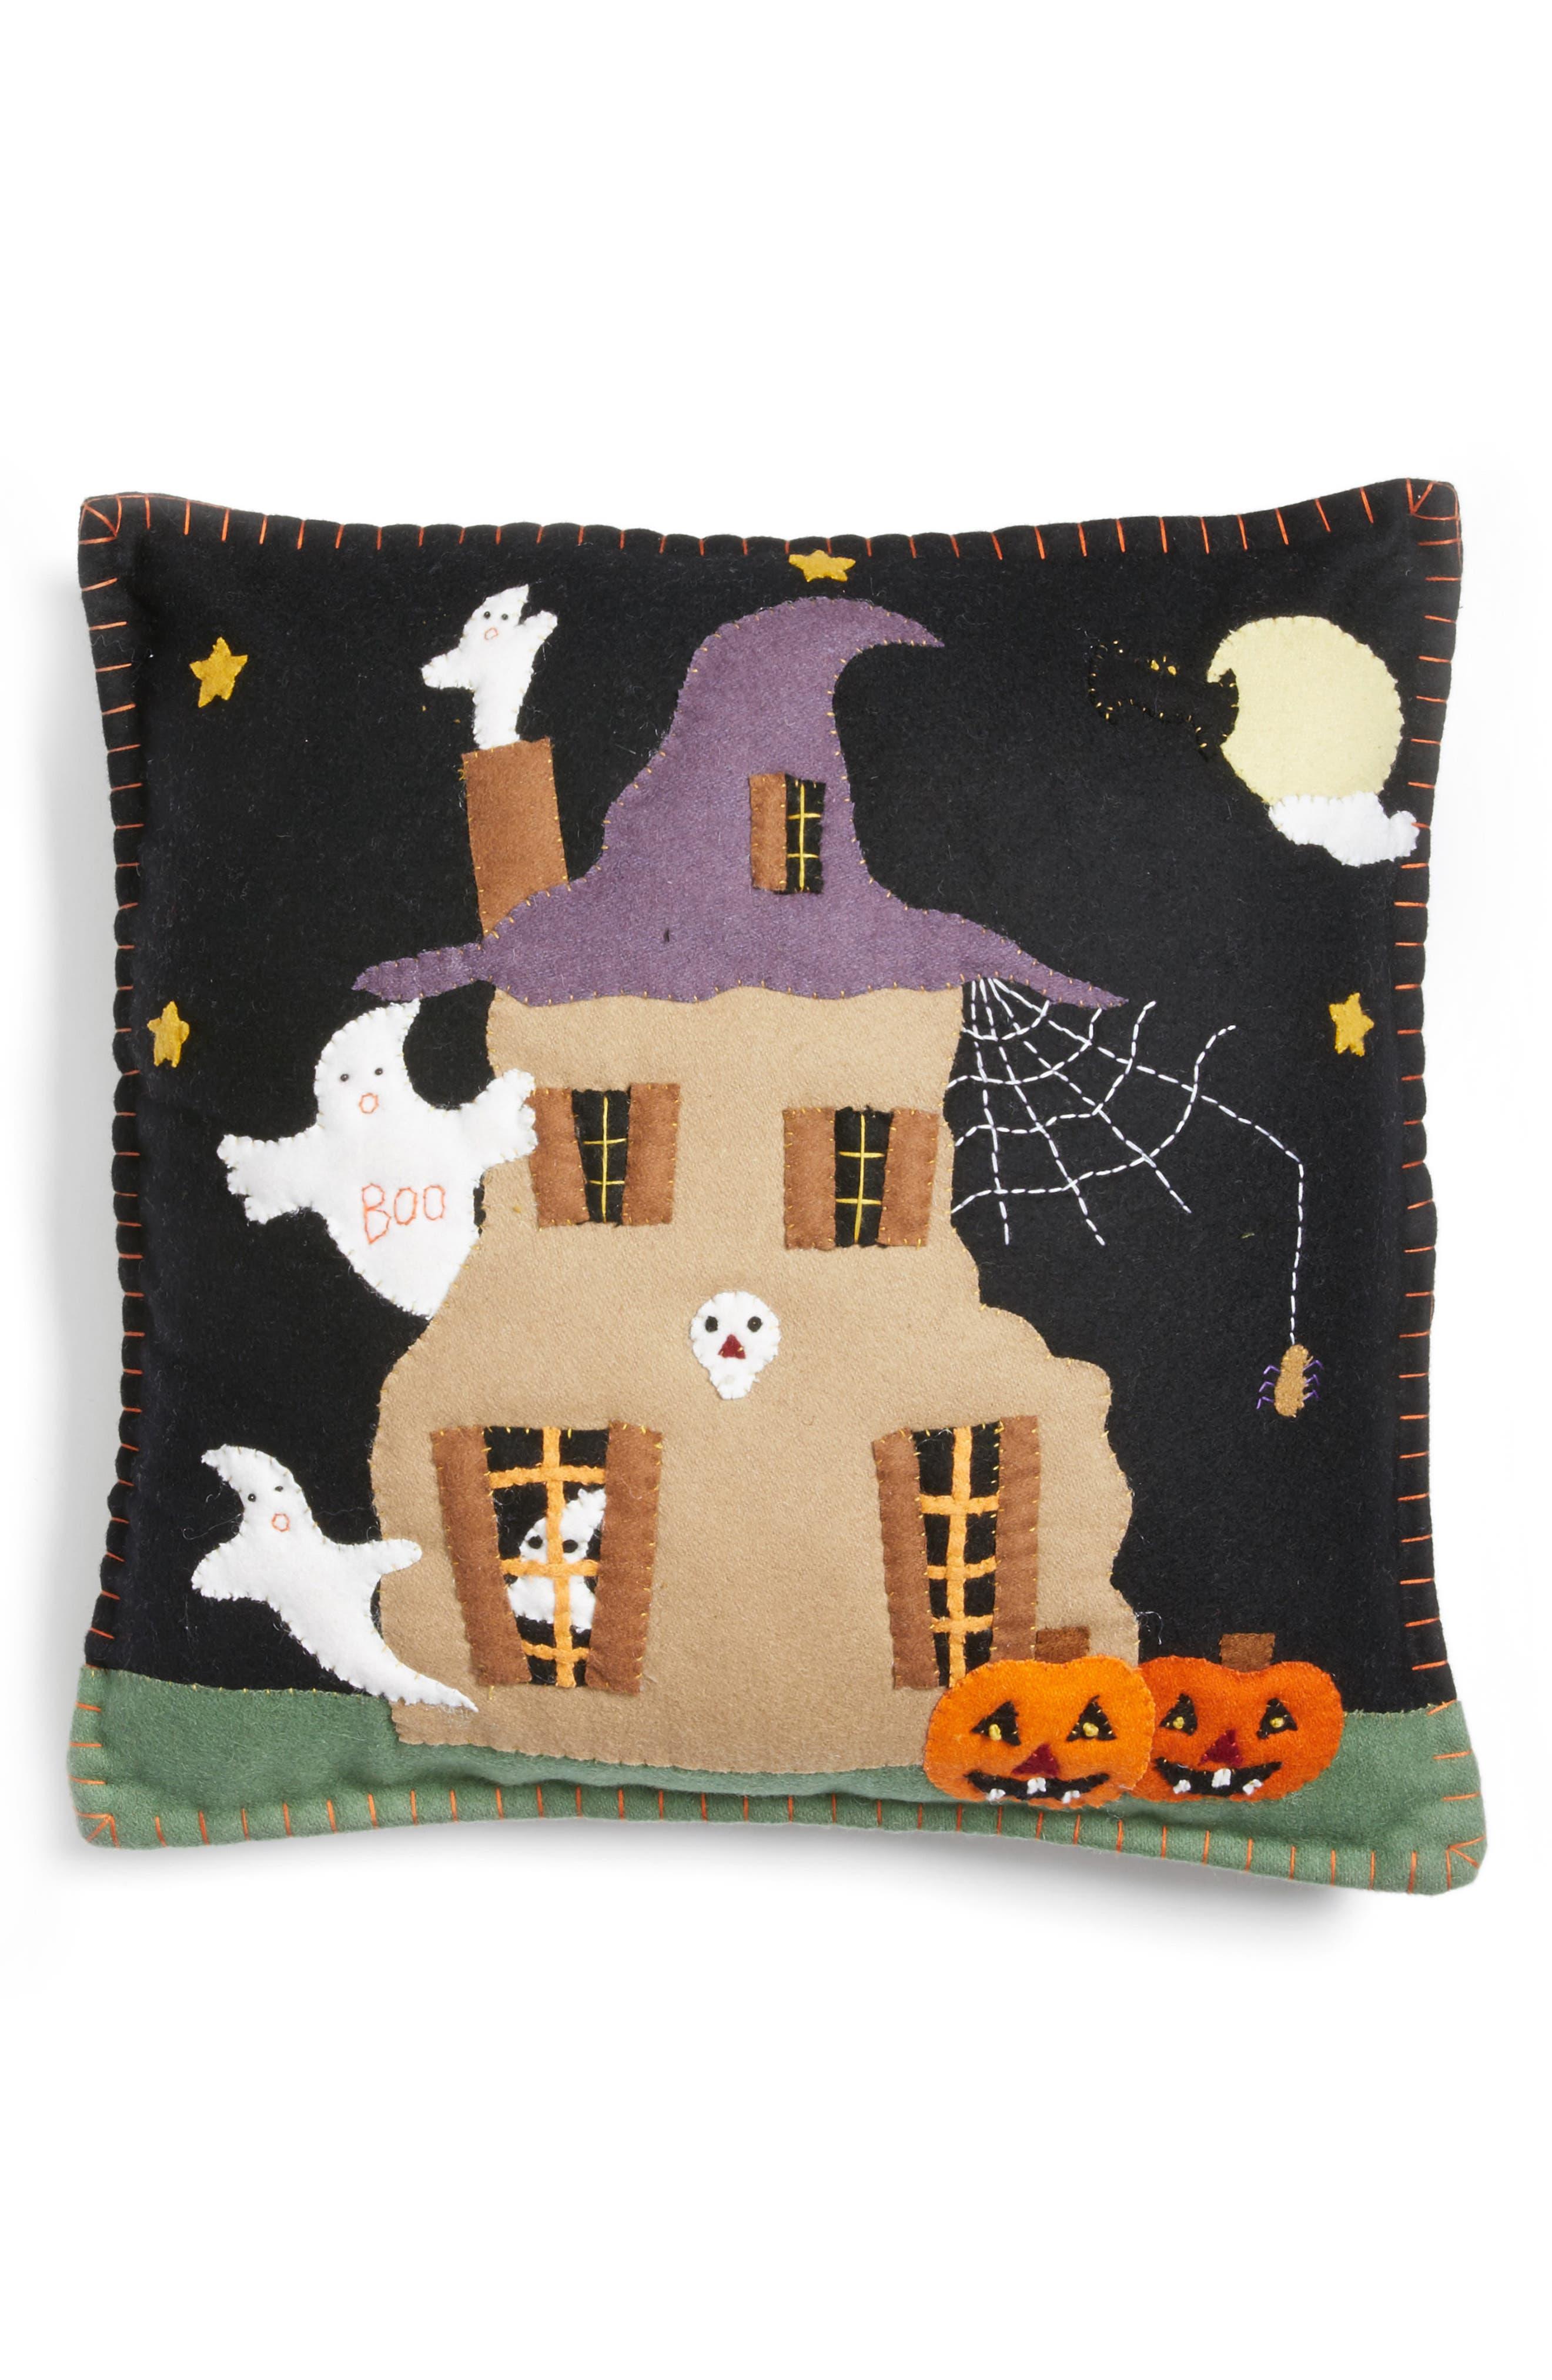 New World Arts Haunted House Pillow